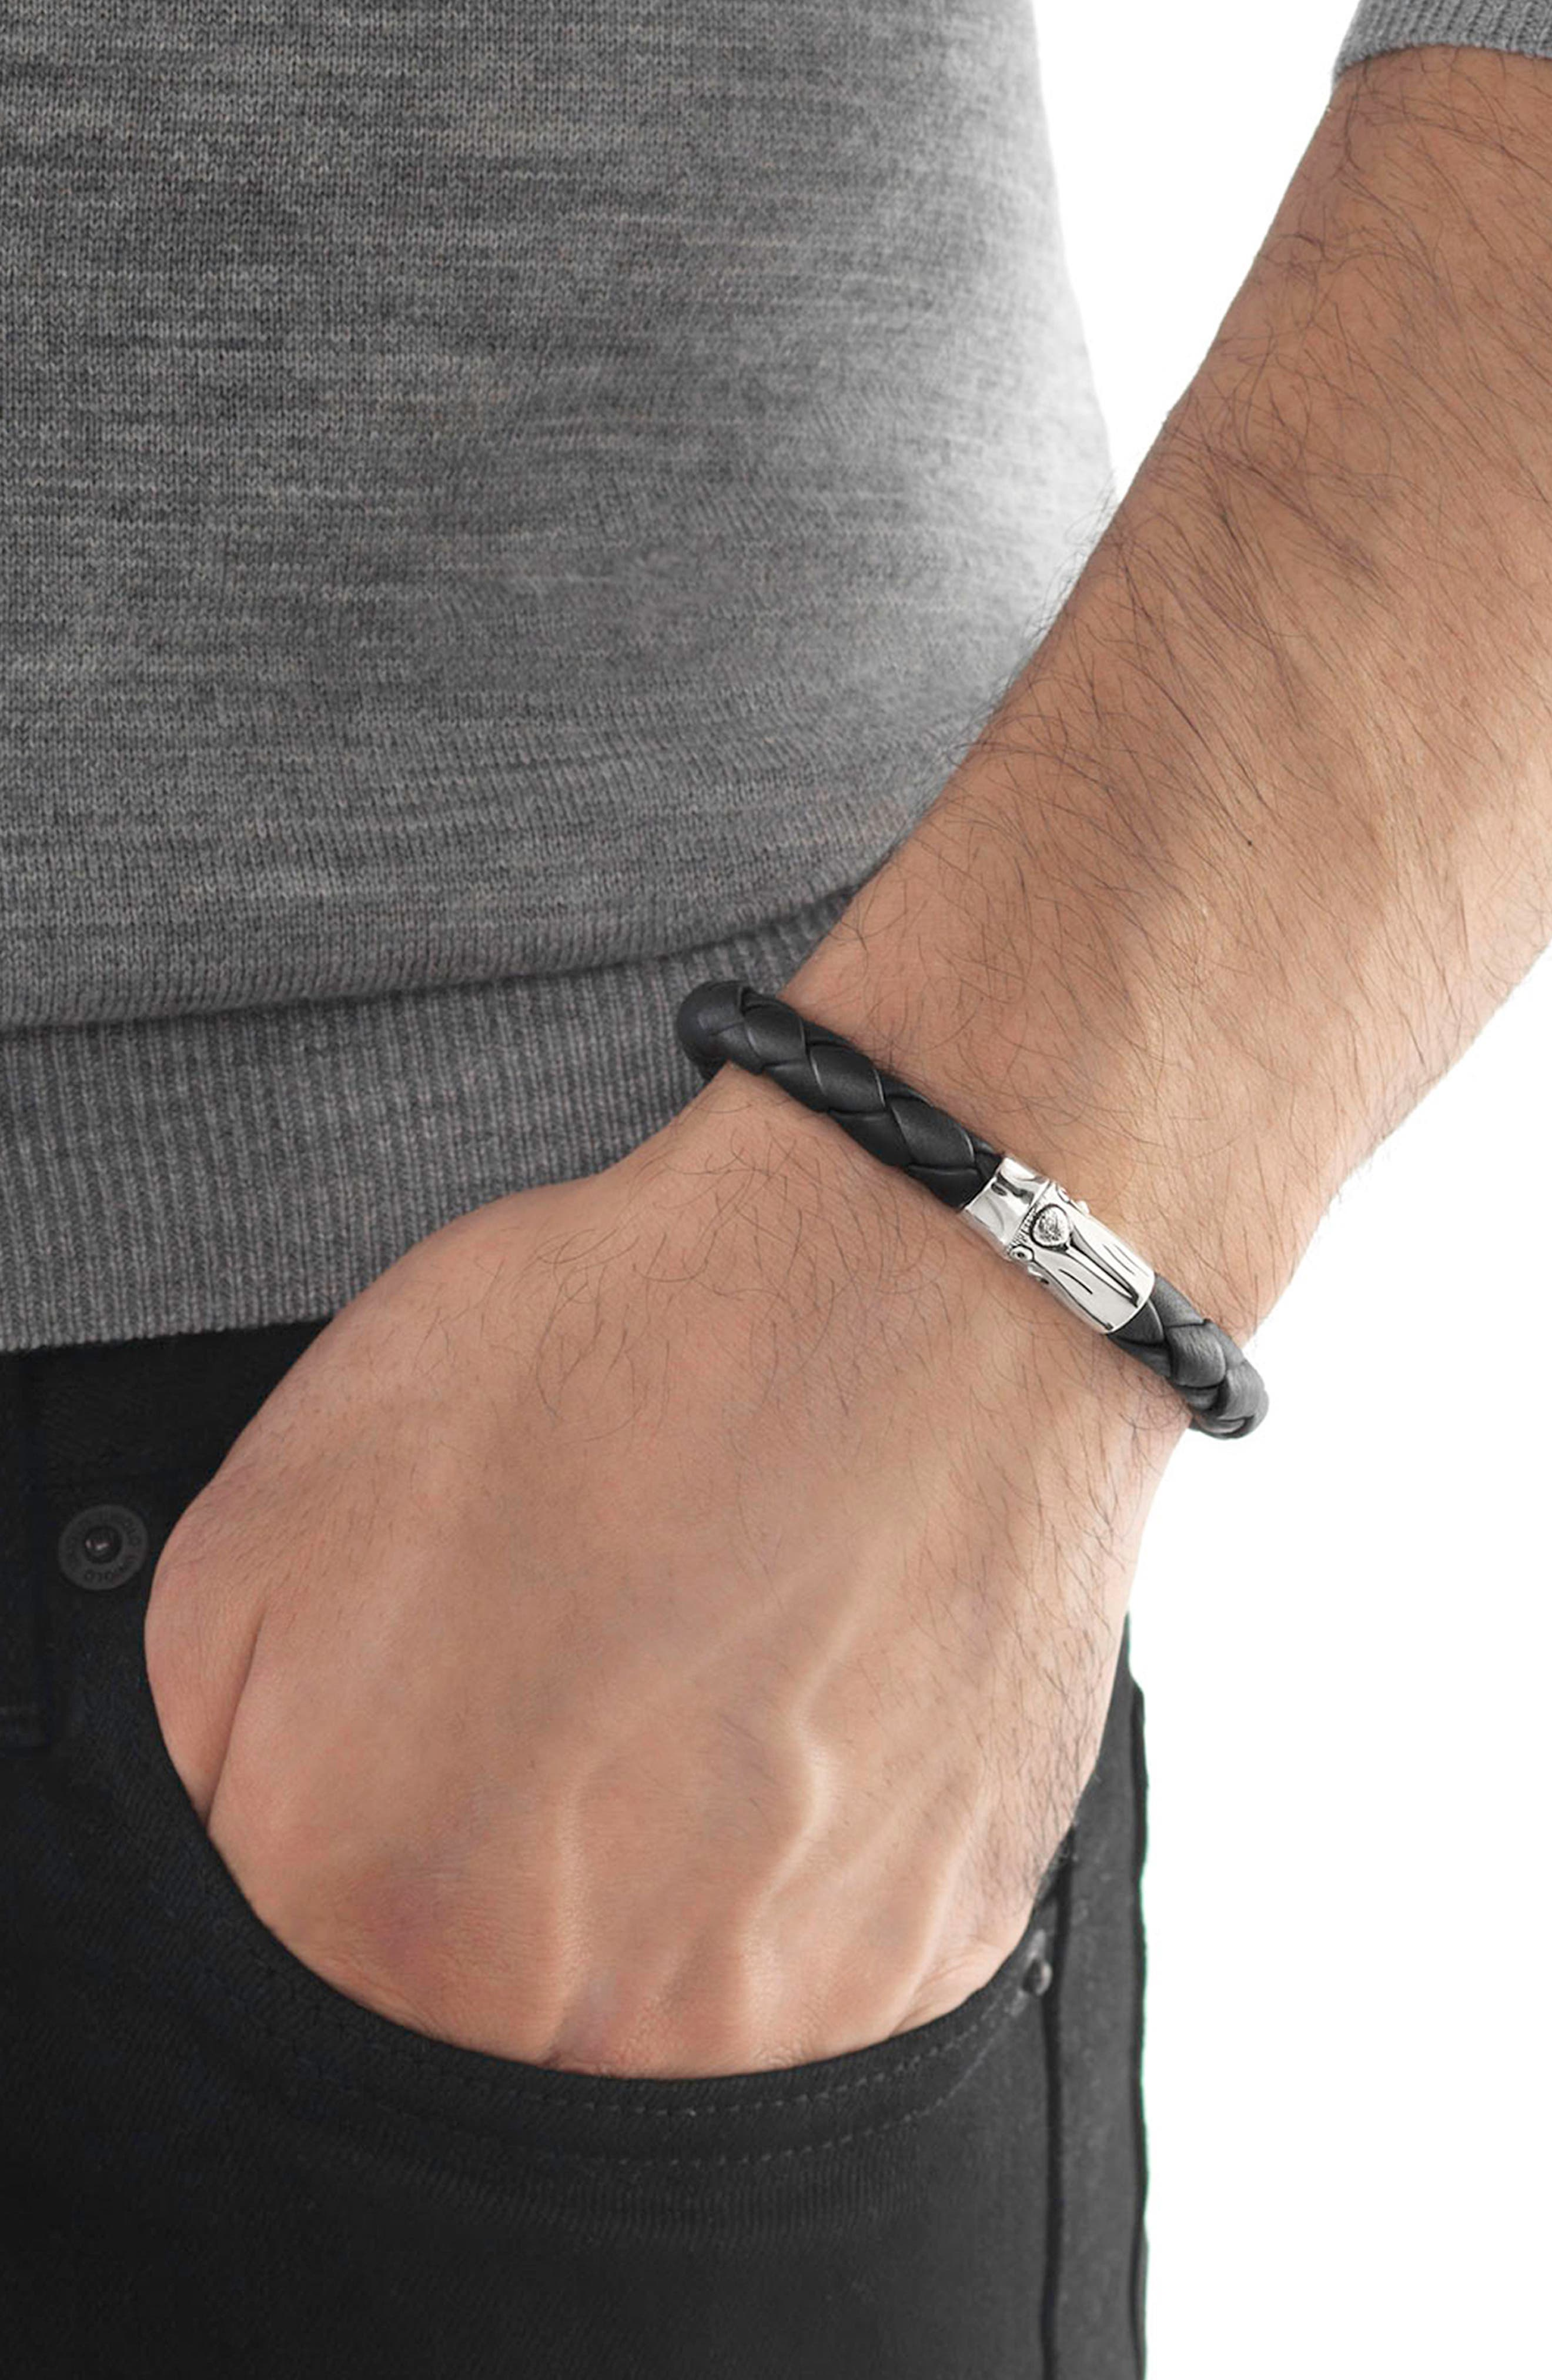 Bamboo Braided Leather Bracelet,                             Alternate thumbnail 2, color,                             SILVER/ BLACK